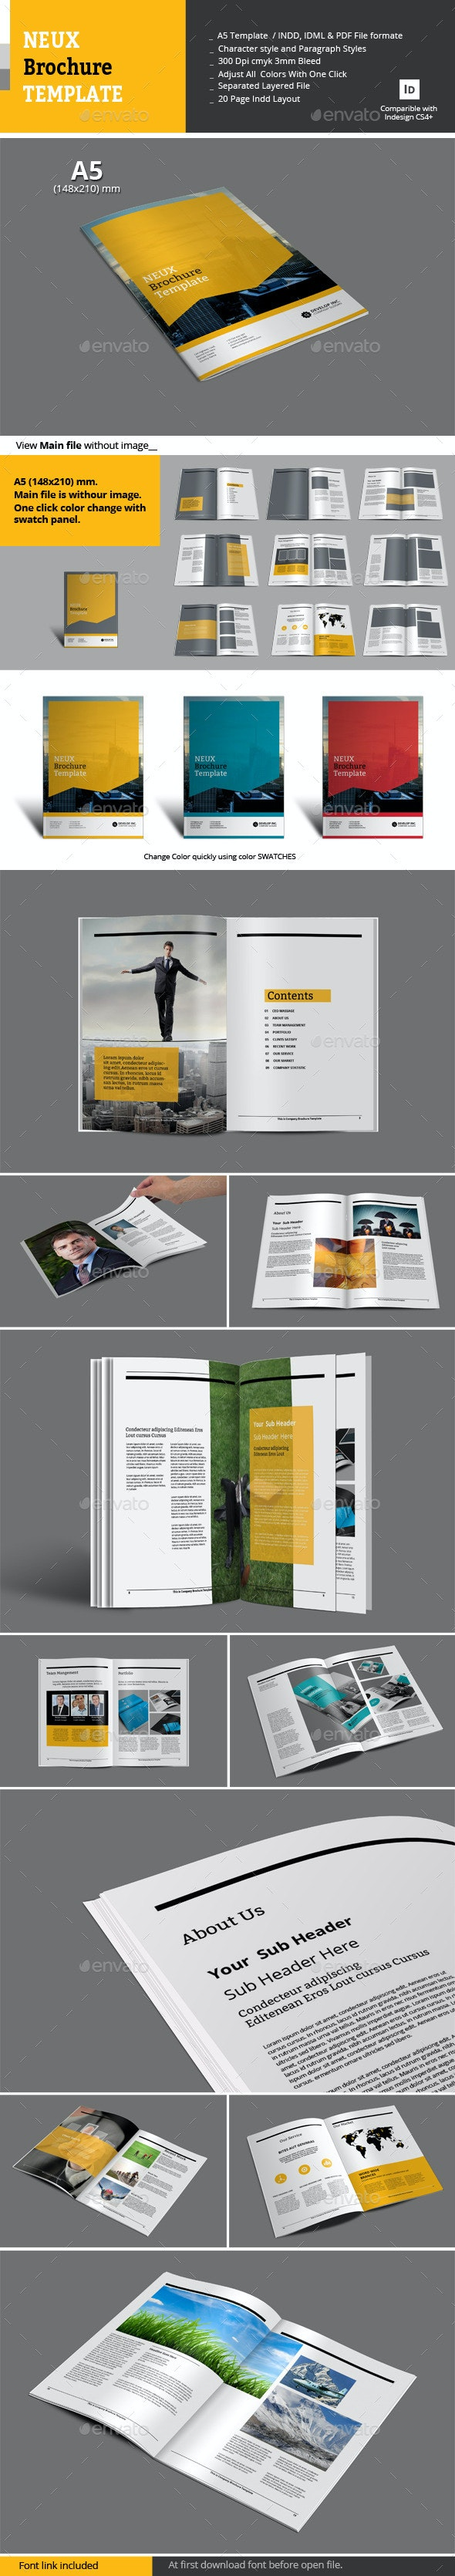 Neux Brochure Templates - Corporate Brochures